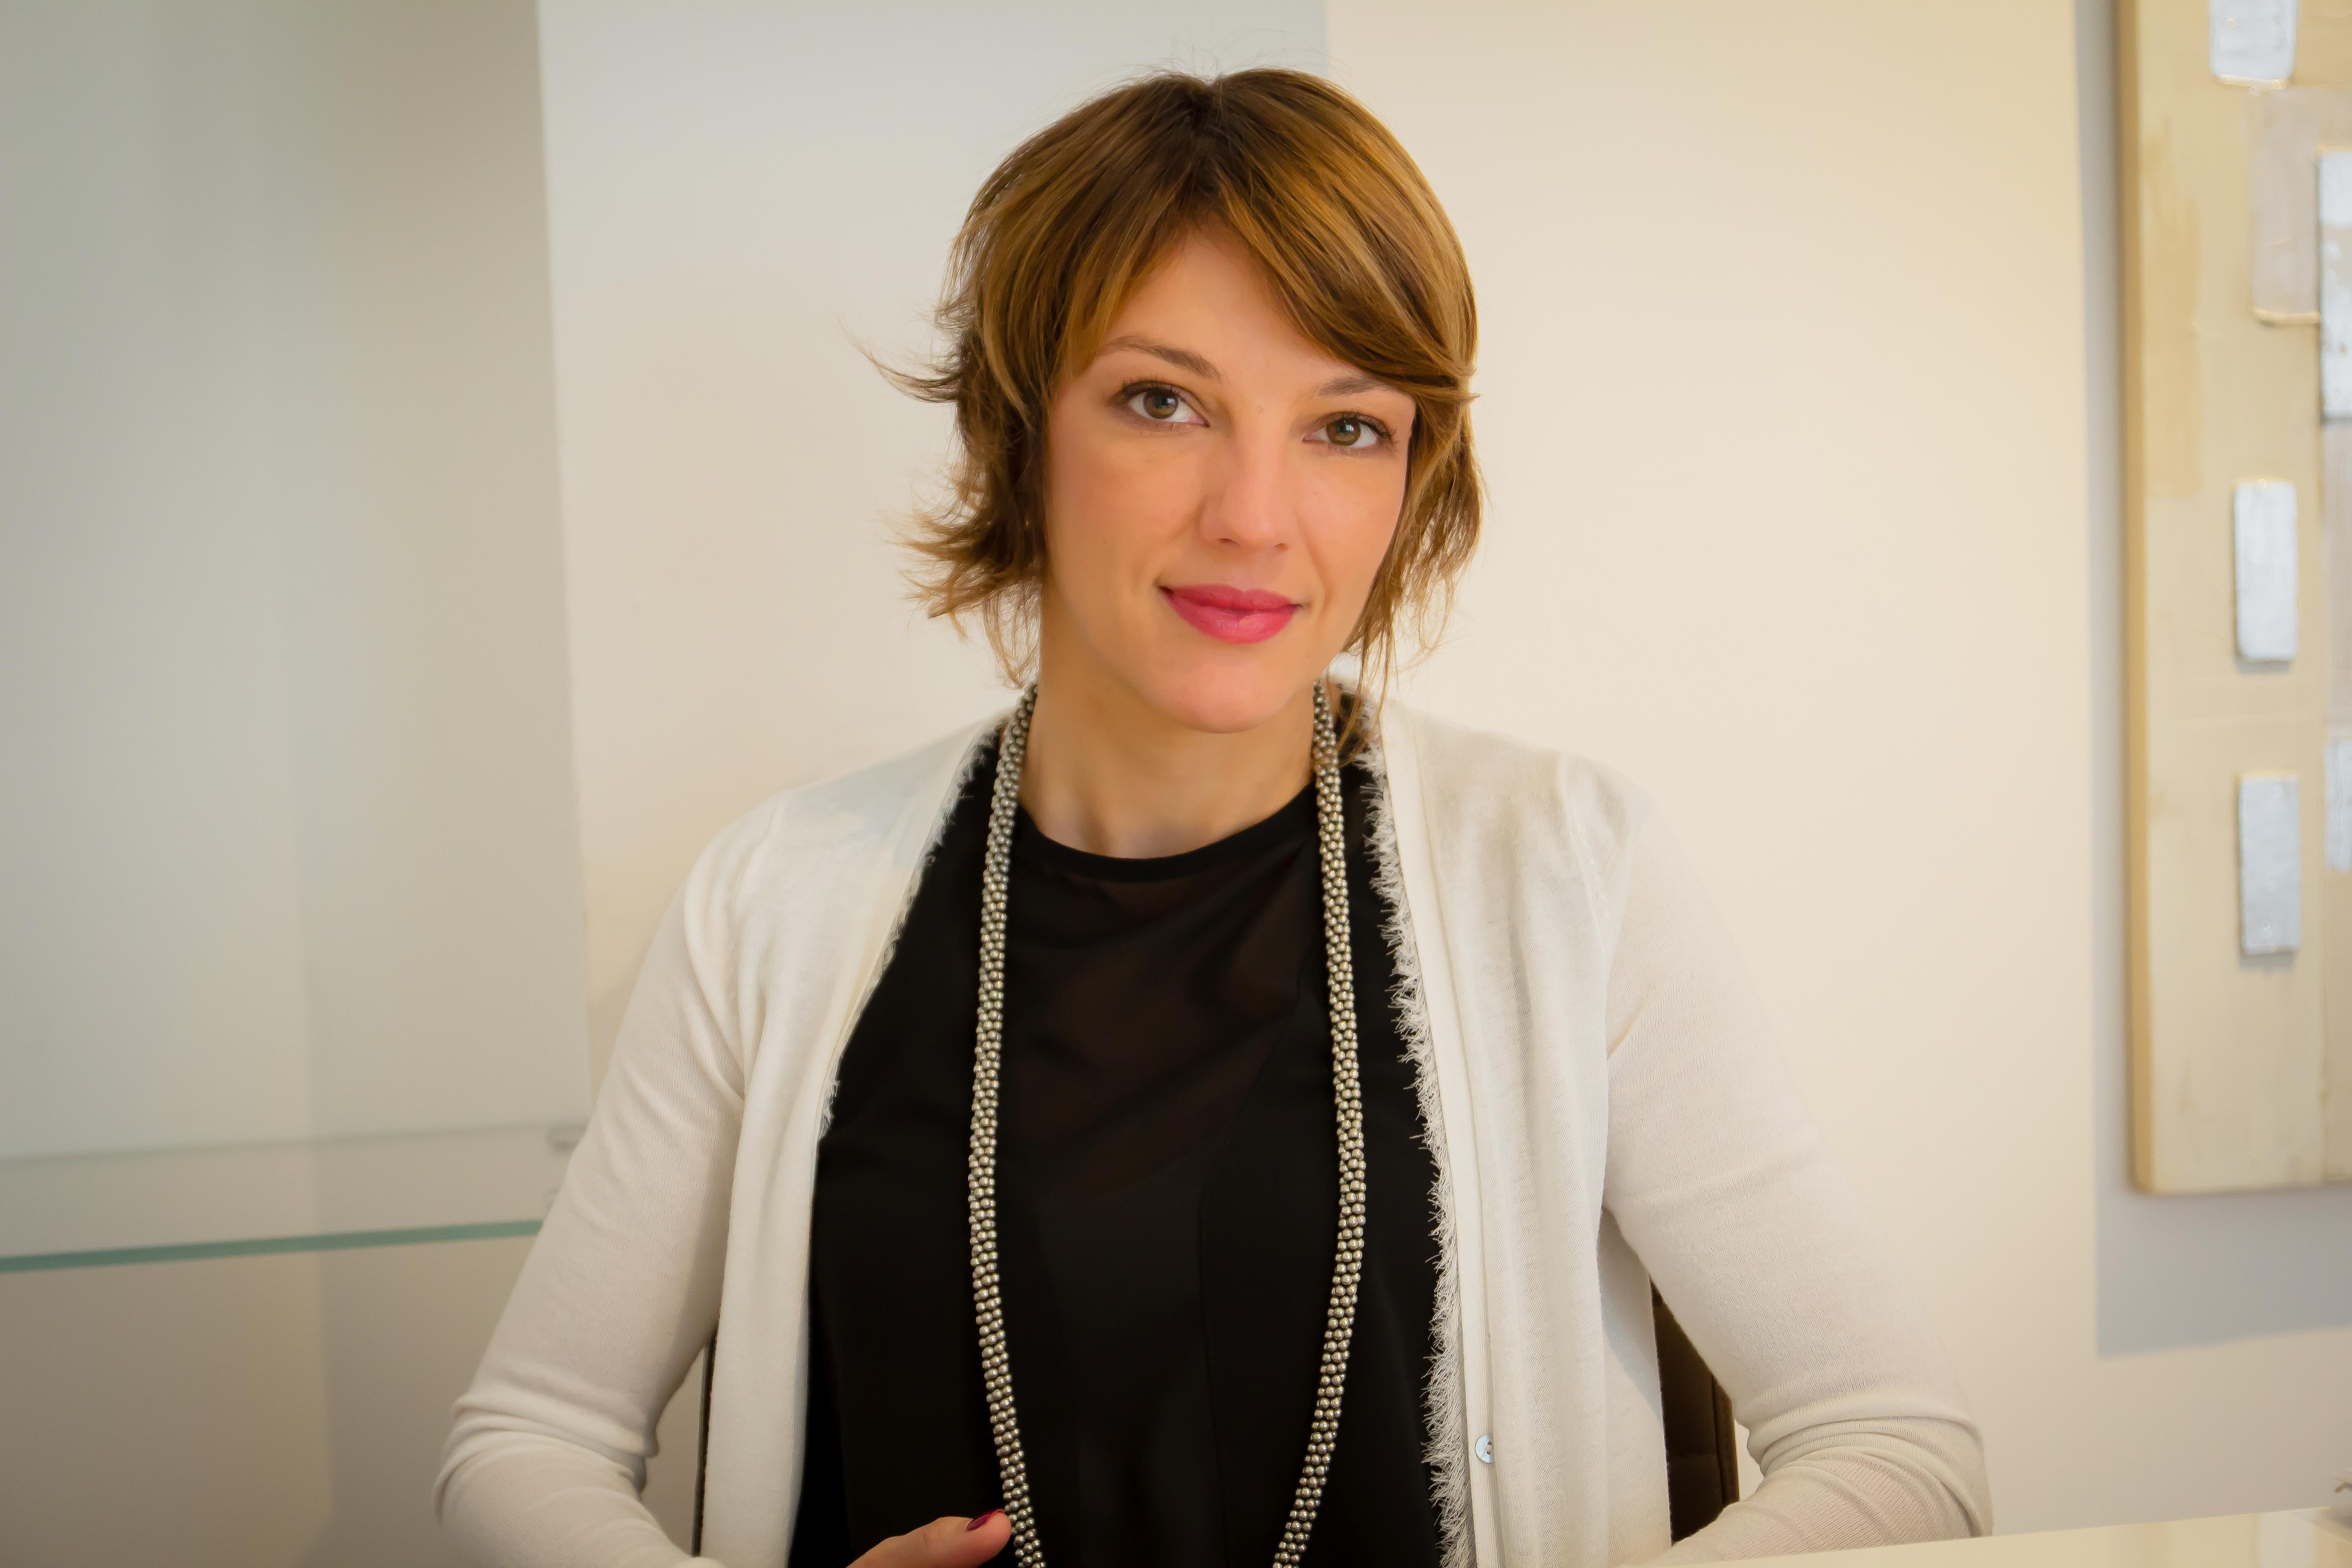 Donatella Bolzon